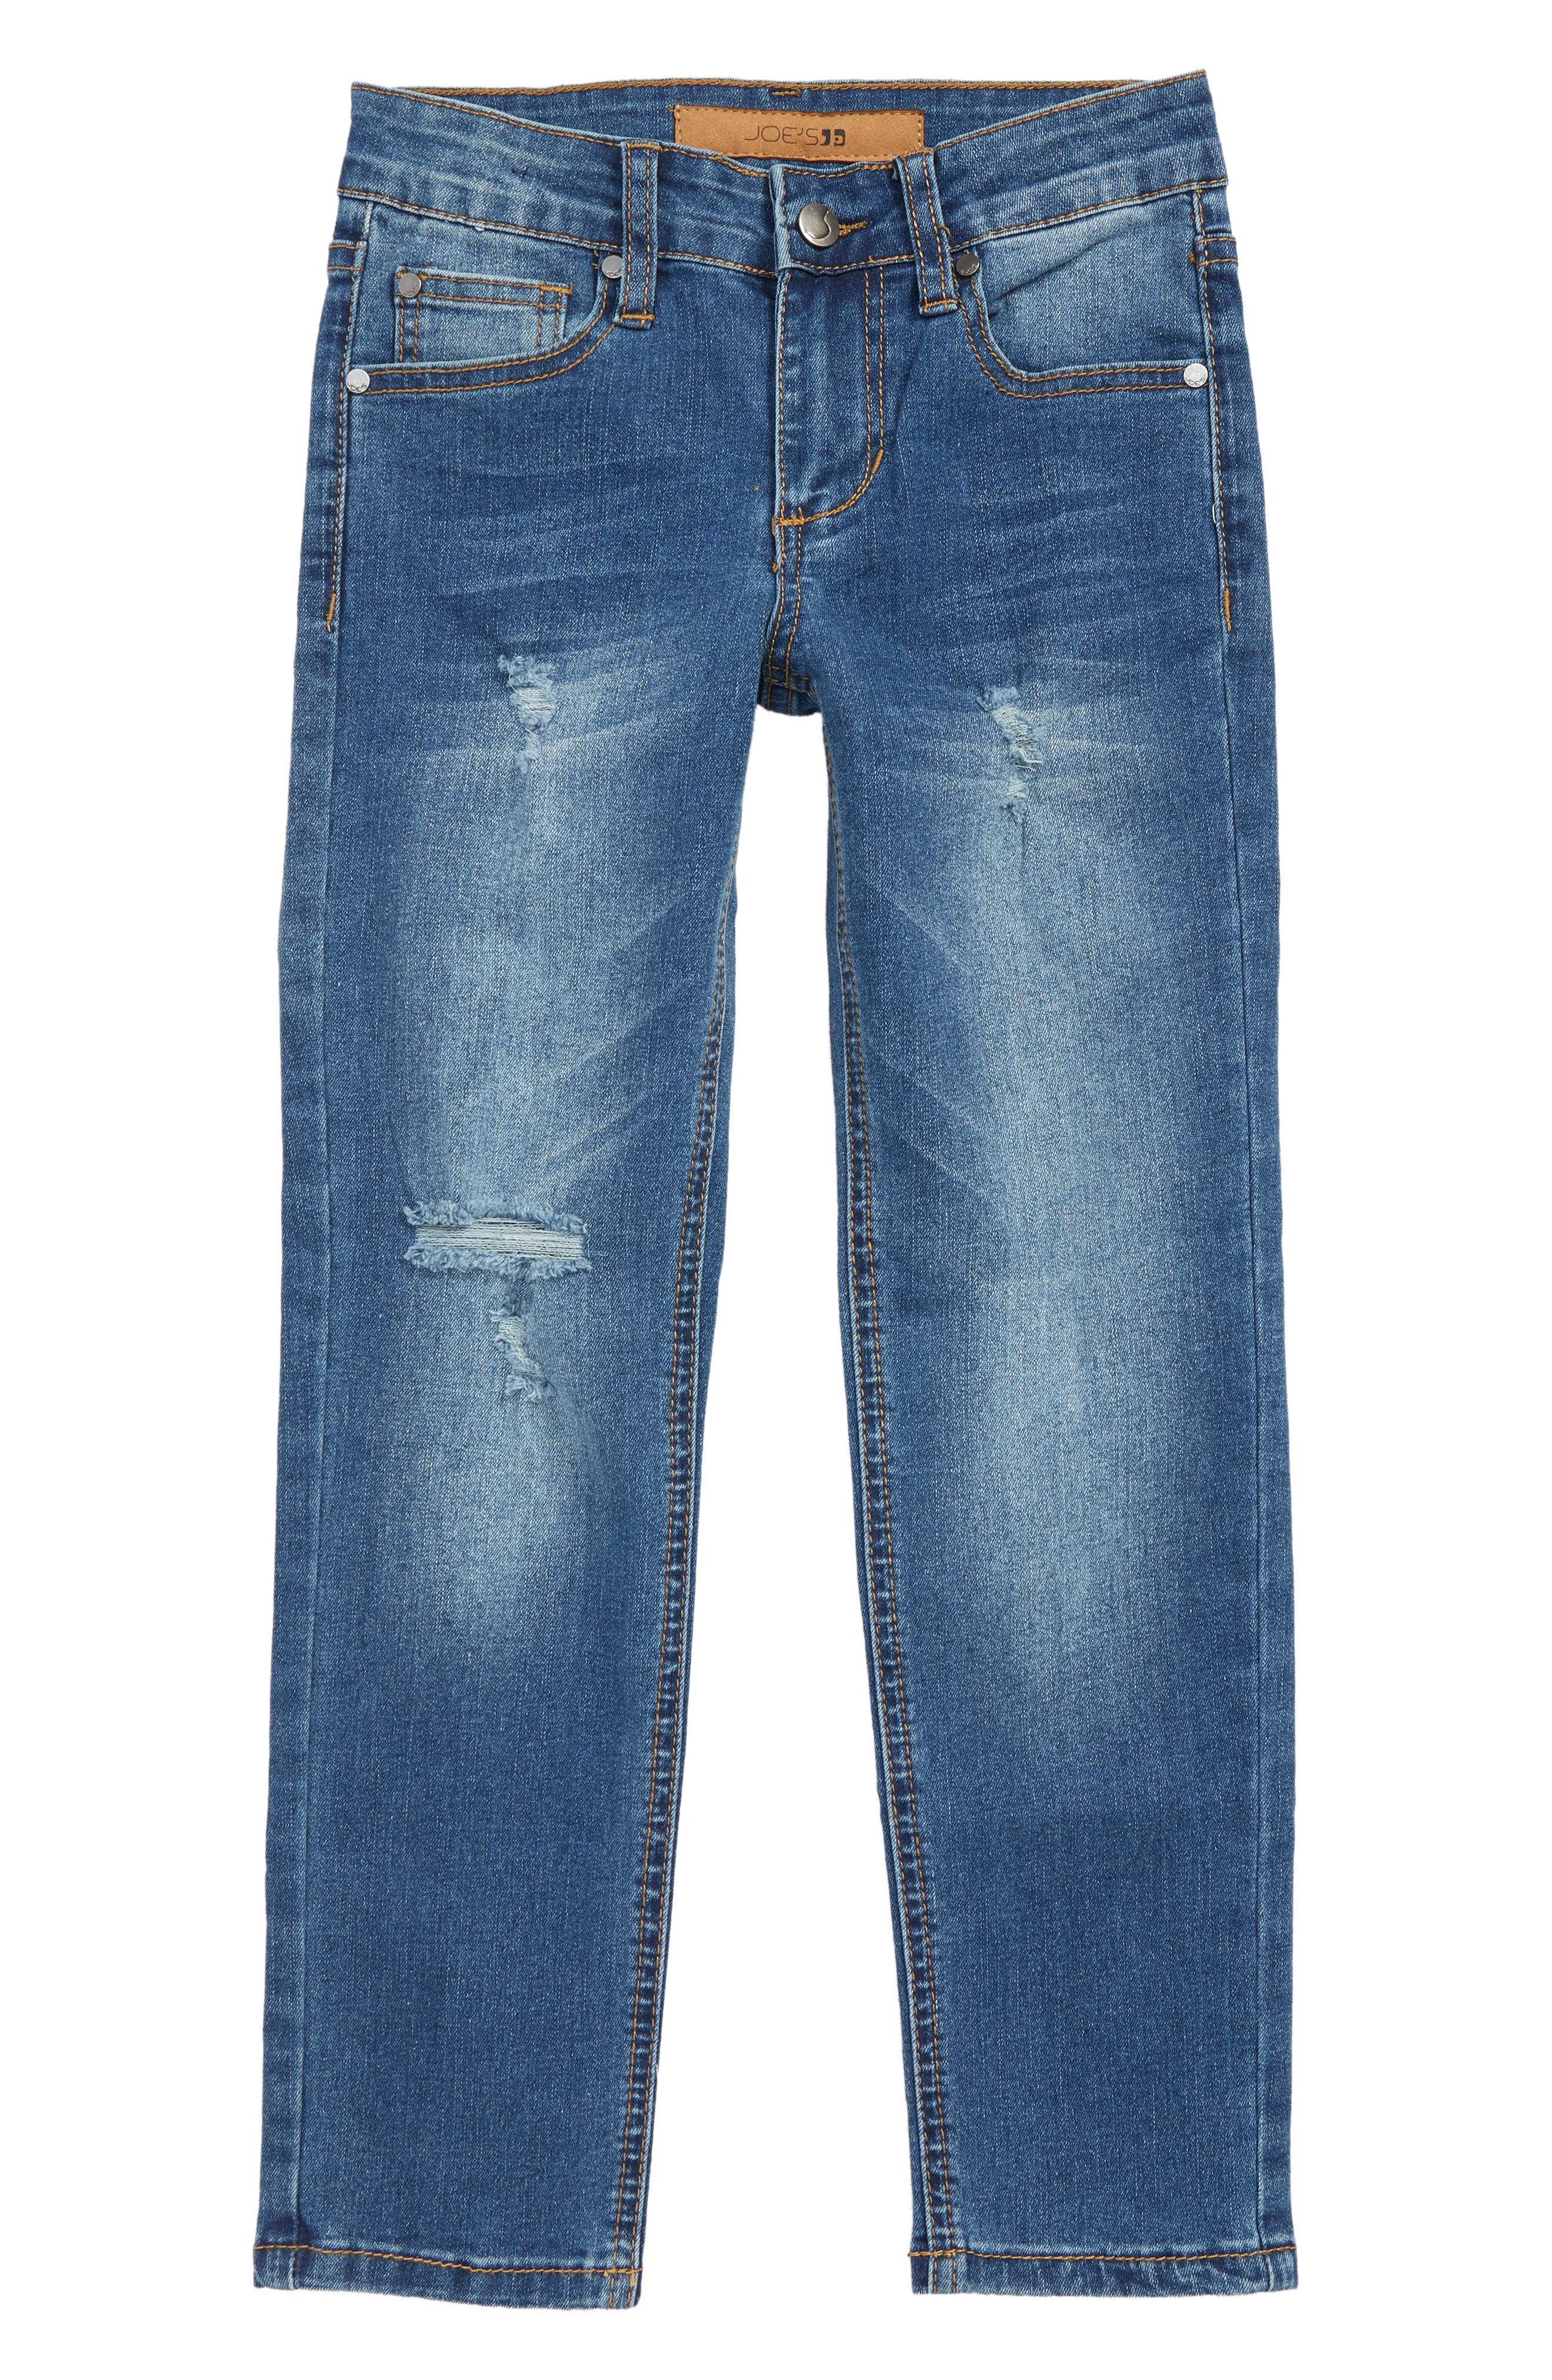 Boys JoeS Rad Skinny Fit Jeans Size 7  Blue